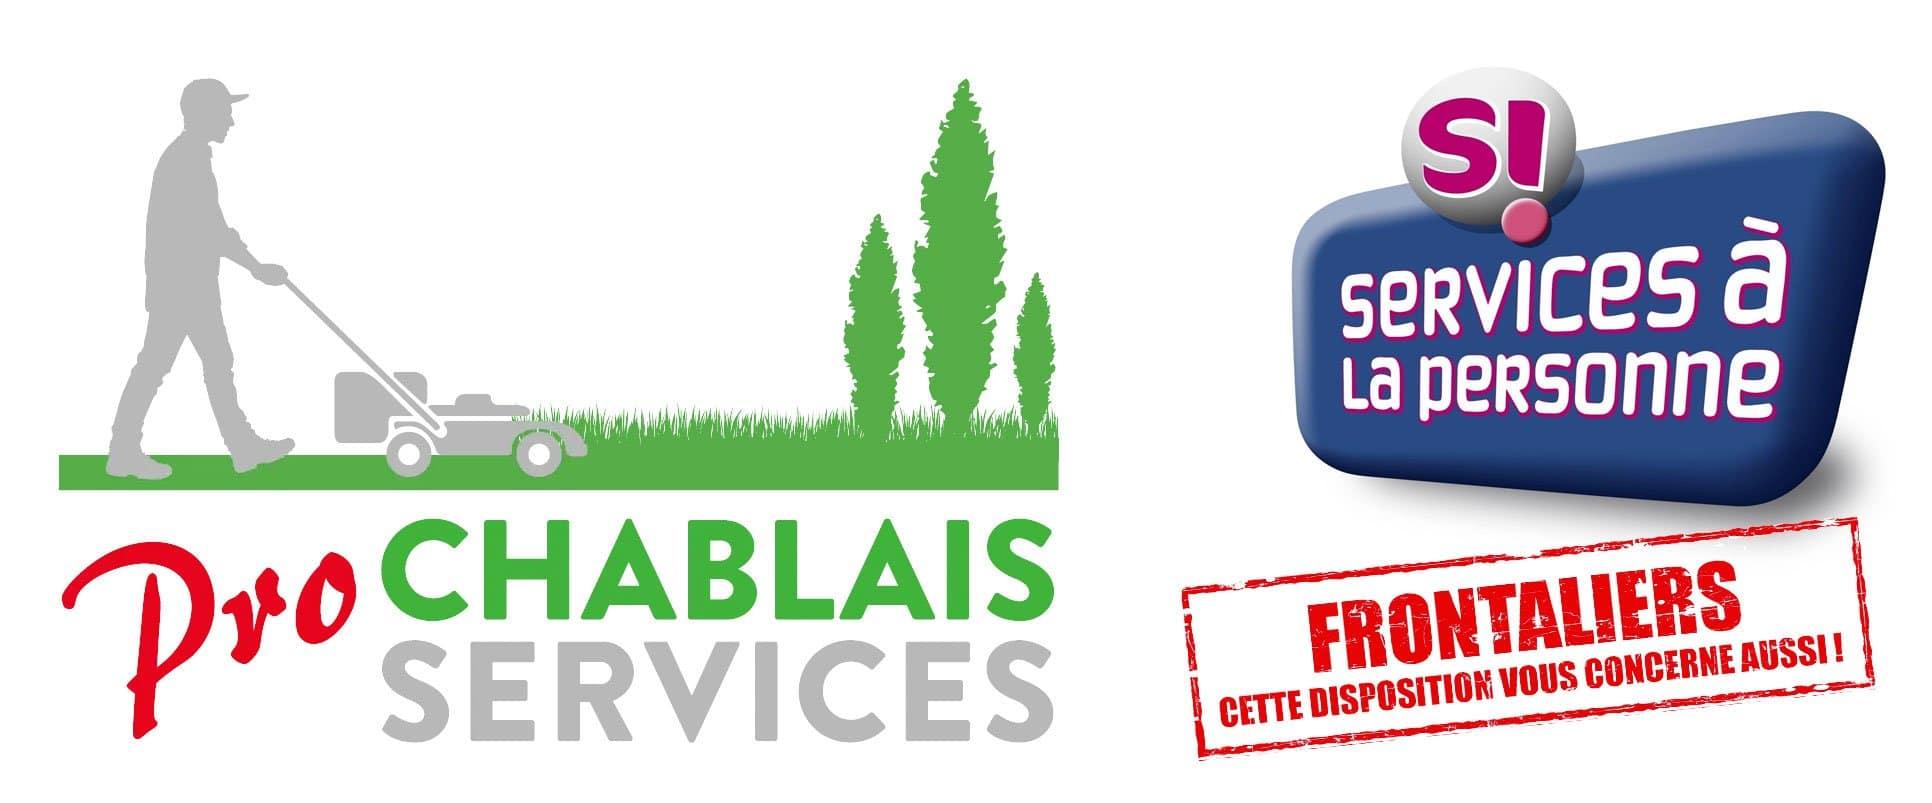 Logo Pro Chablais Services